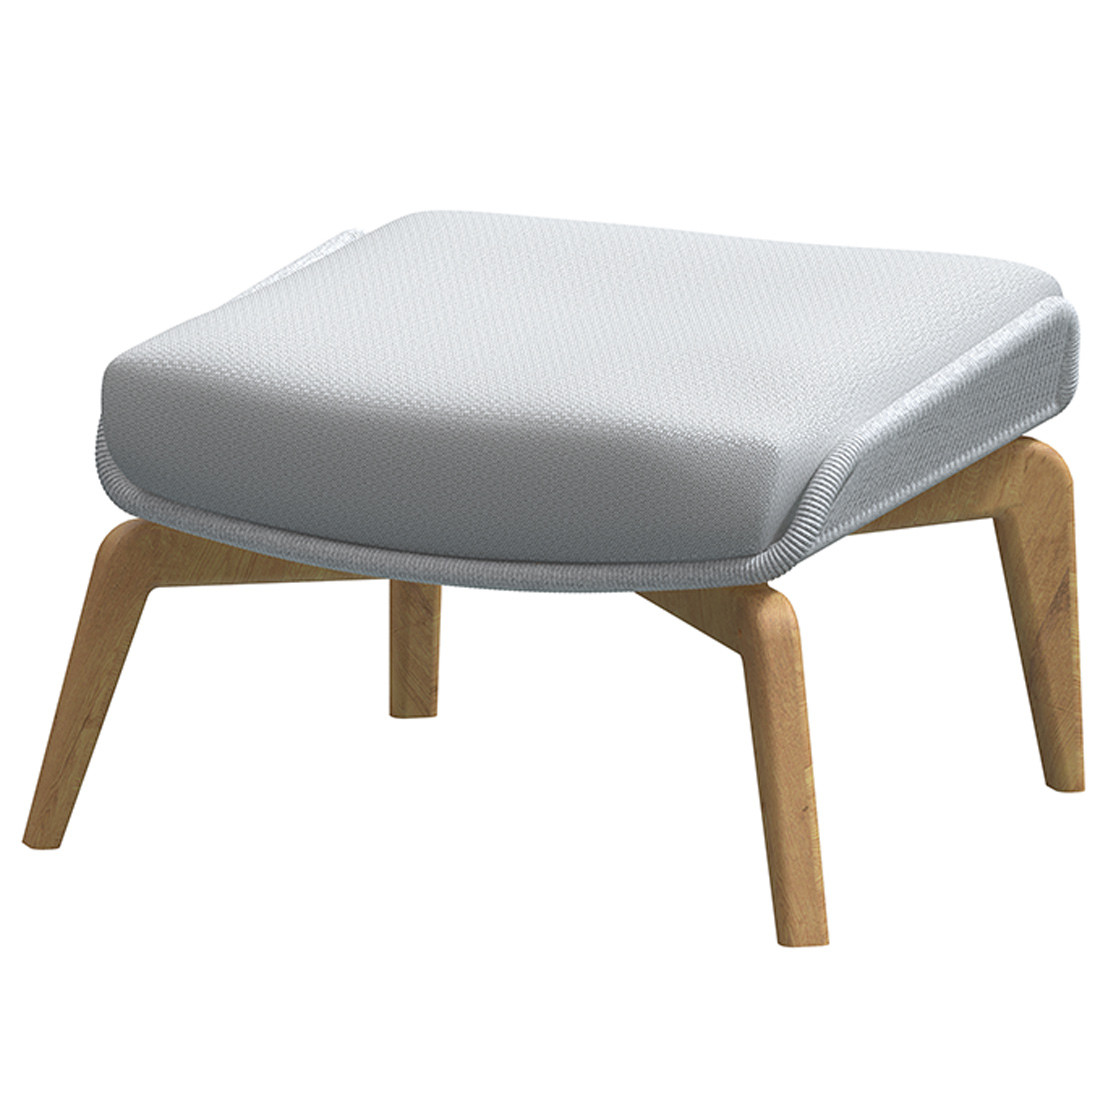 Carthago teak footstool Frozen with cushion